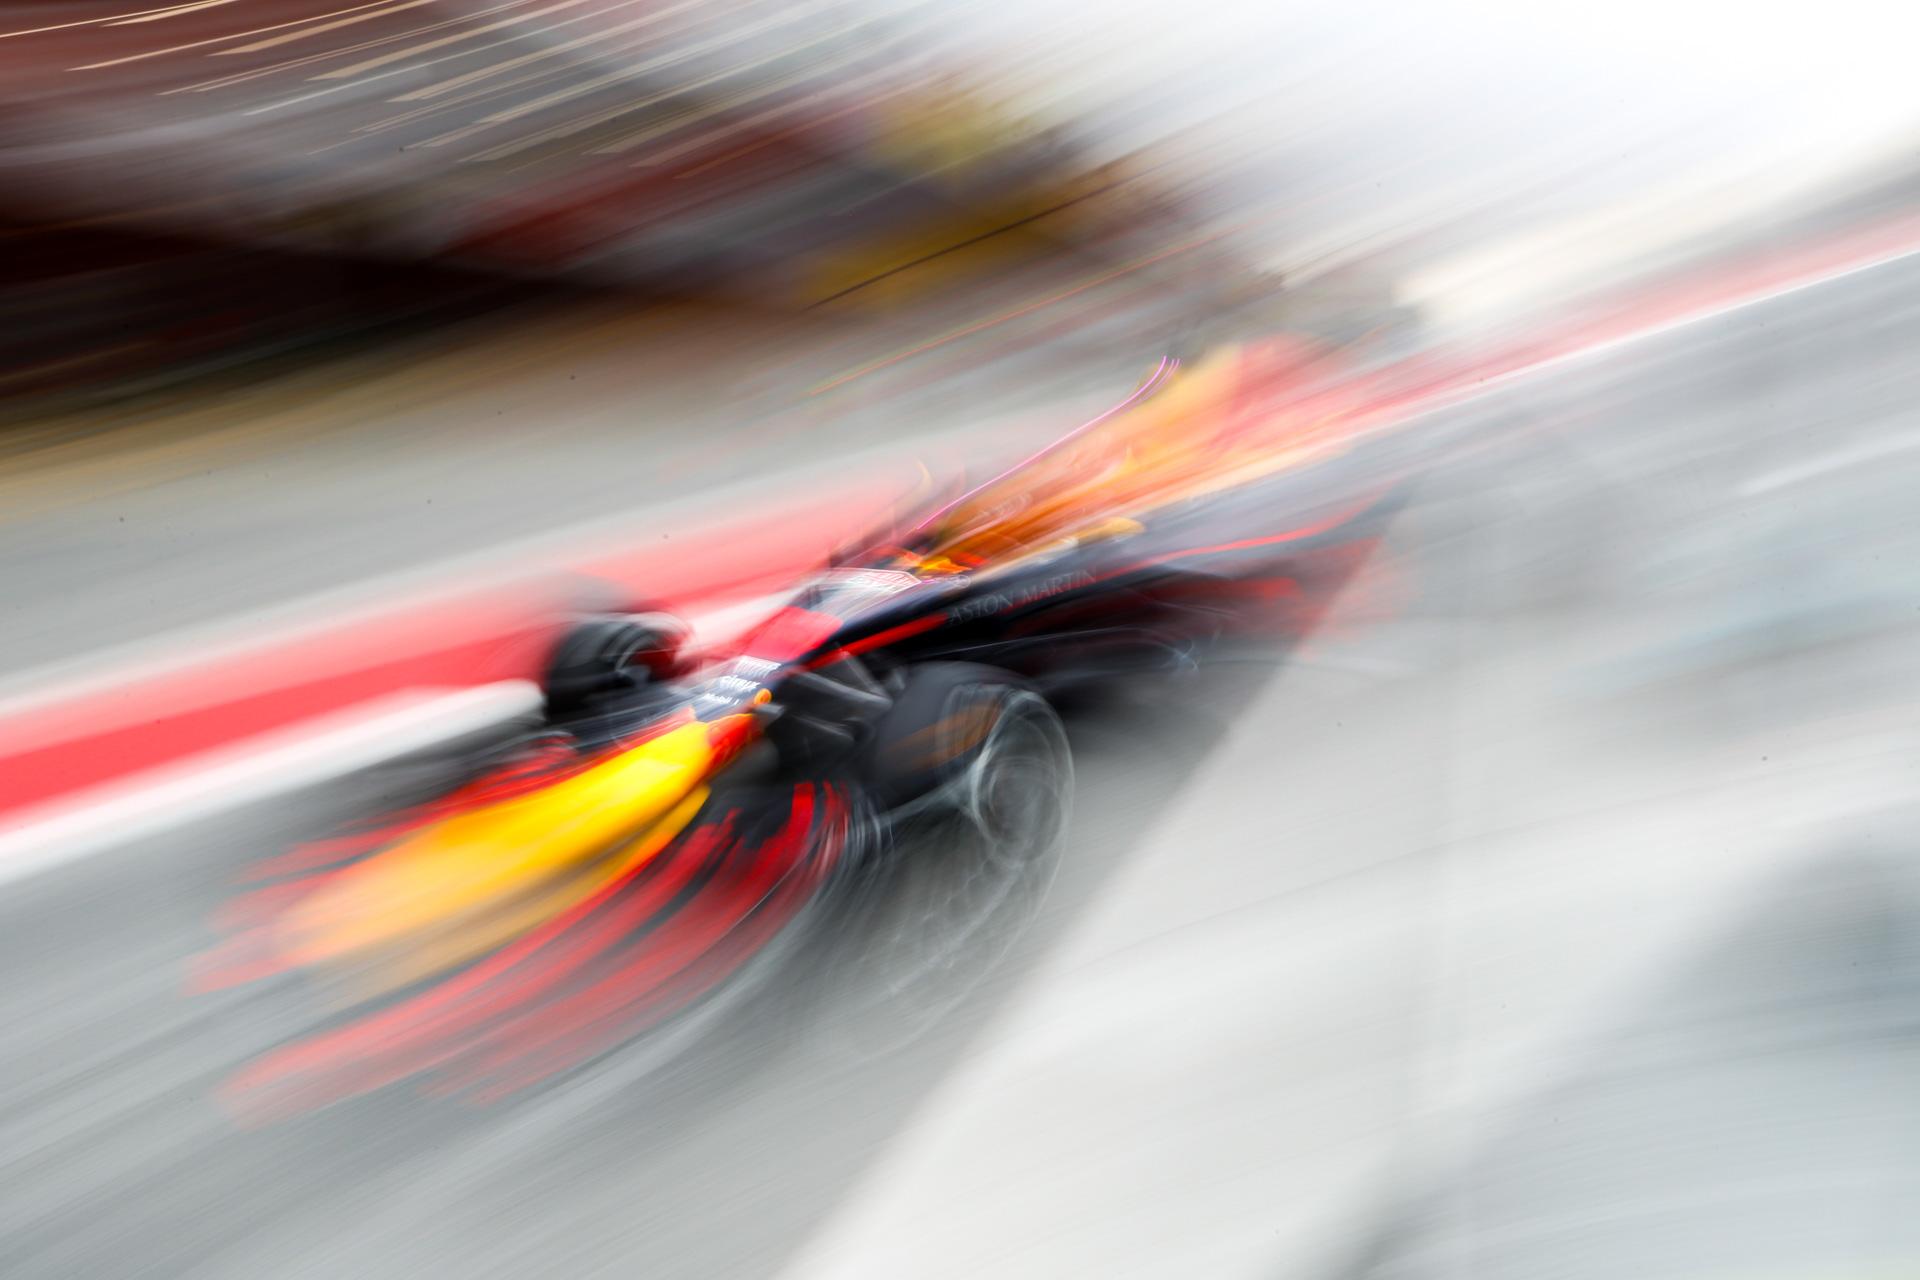 Max VERSTAPPEN - Netherlands - ASTON MARTIN RED BULL RACING - #33 - F1 Test Days - Circuit de Barcelona Catalunya - Spain - 08 March 2018